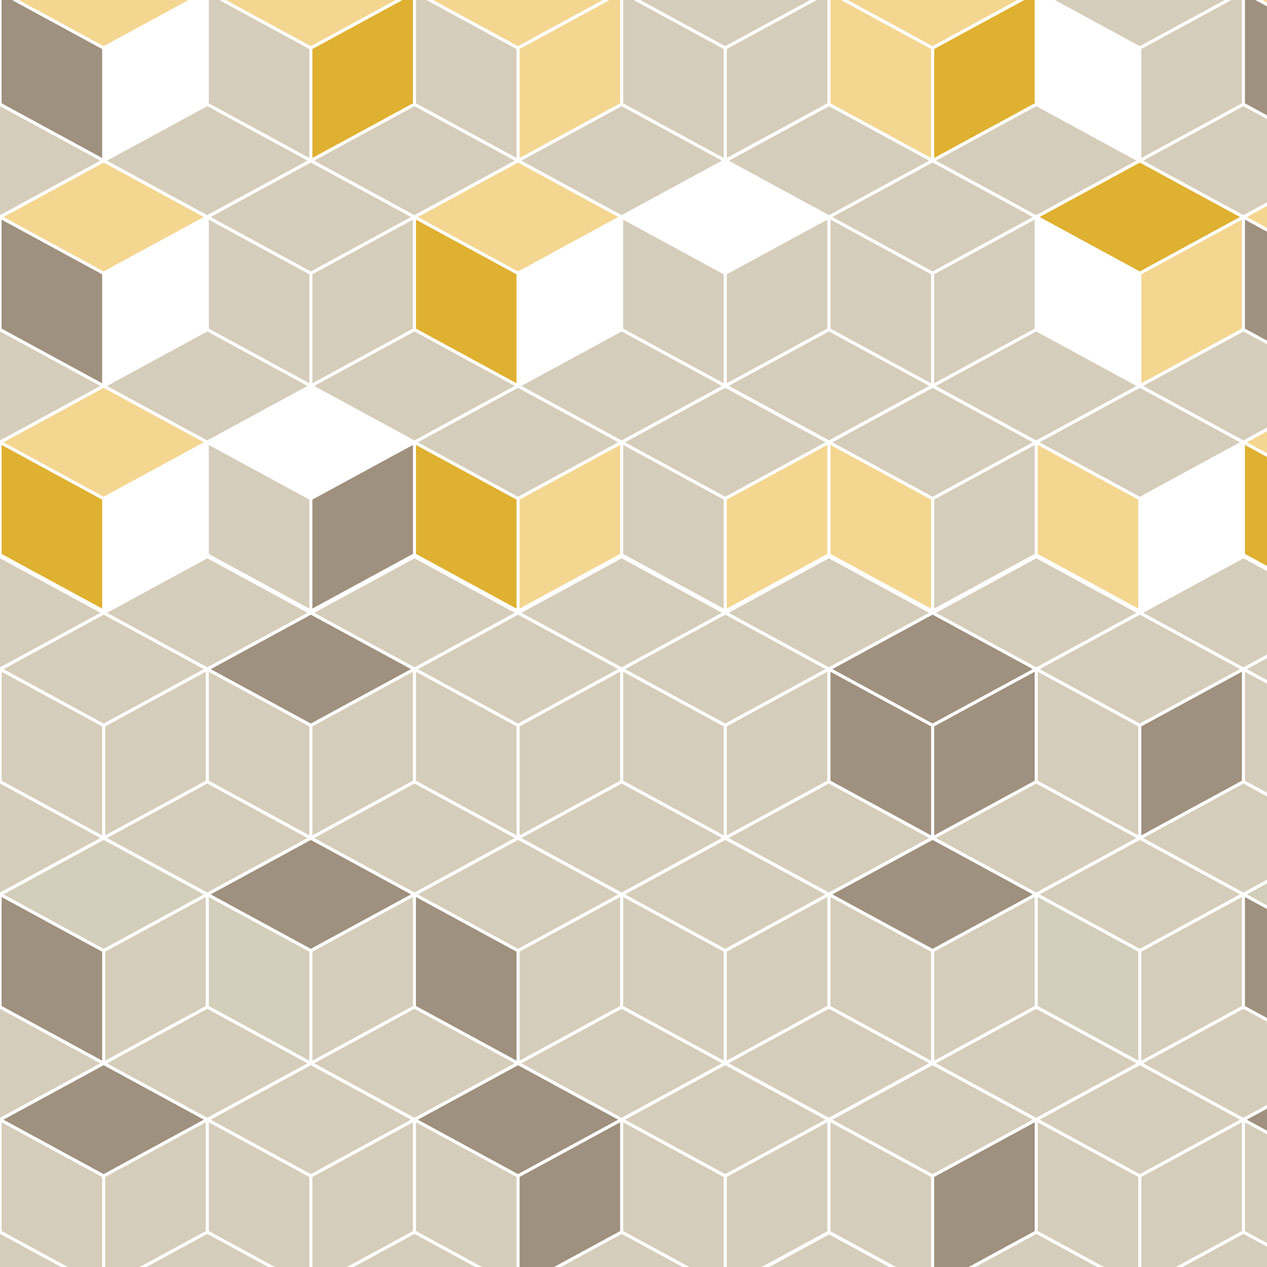 Papel de Parede Geométrico Cubos Cinza e Amarelo